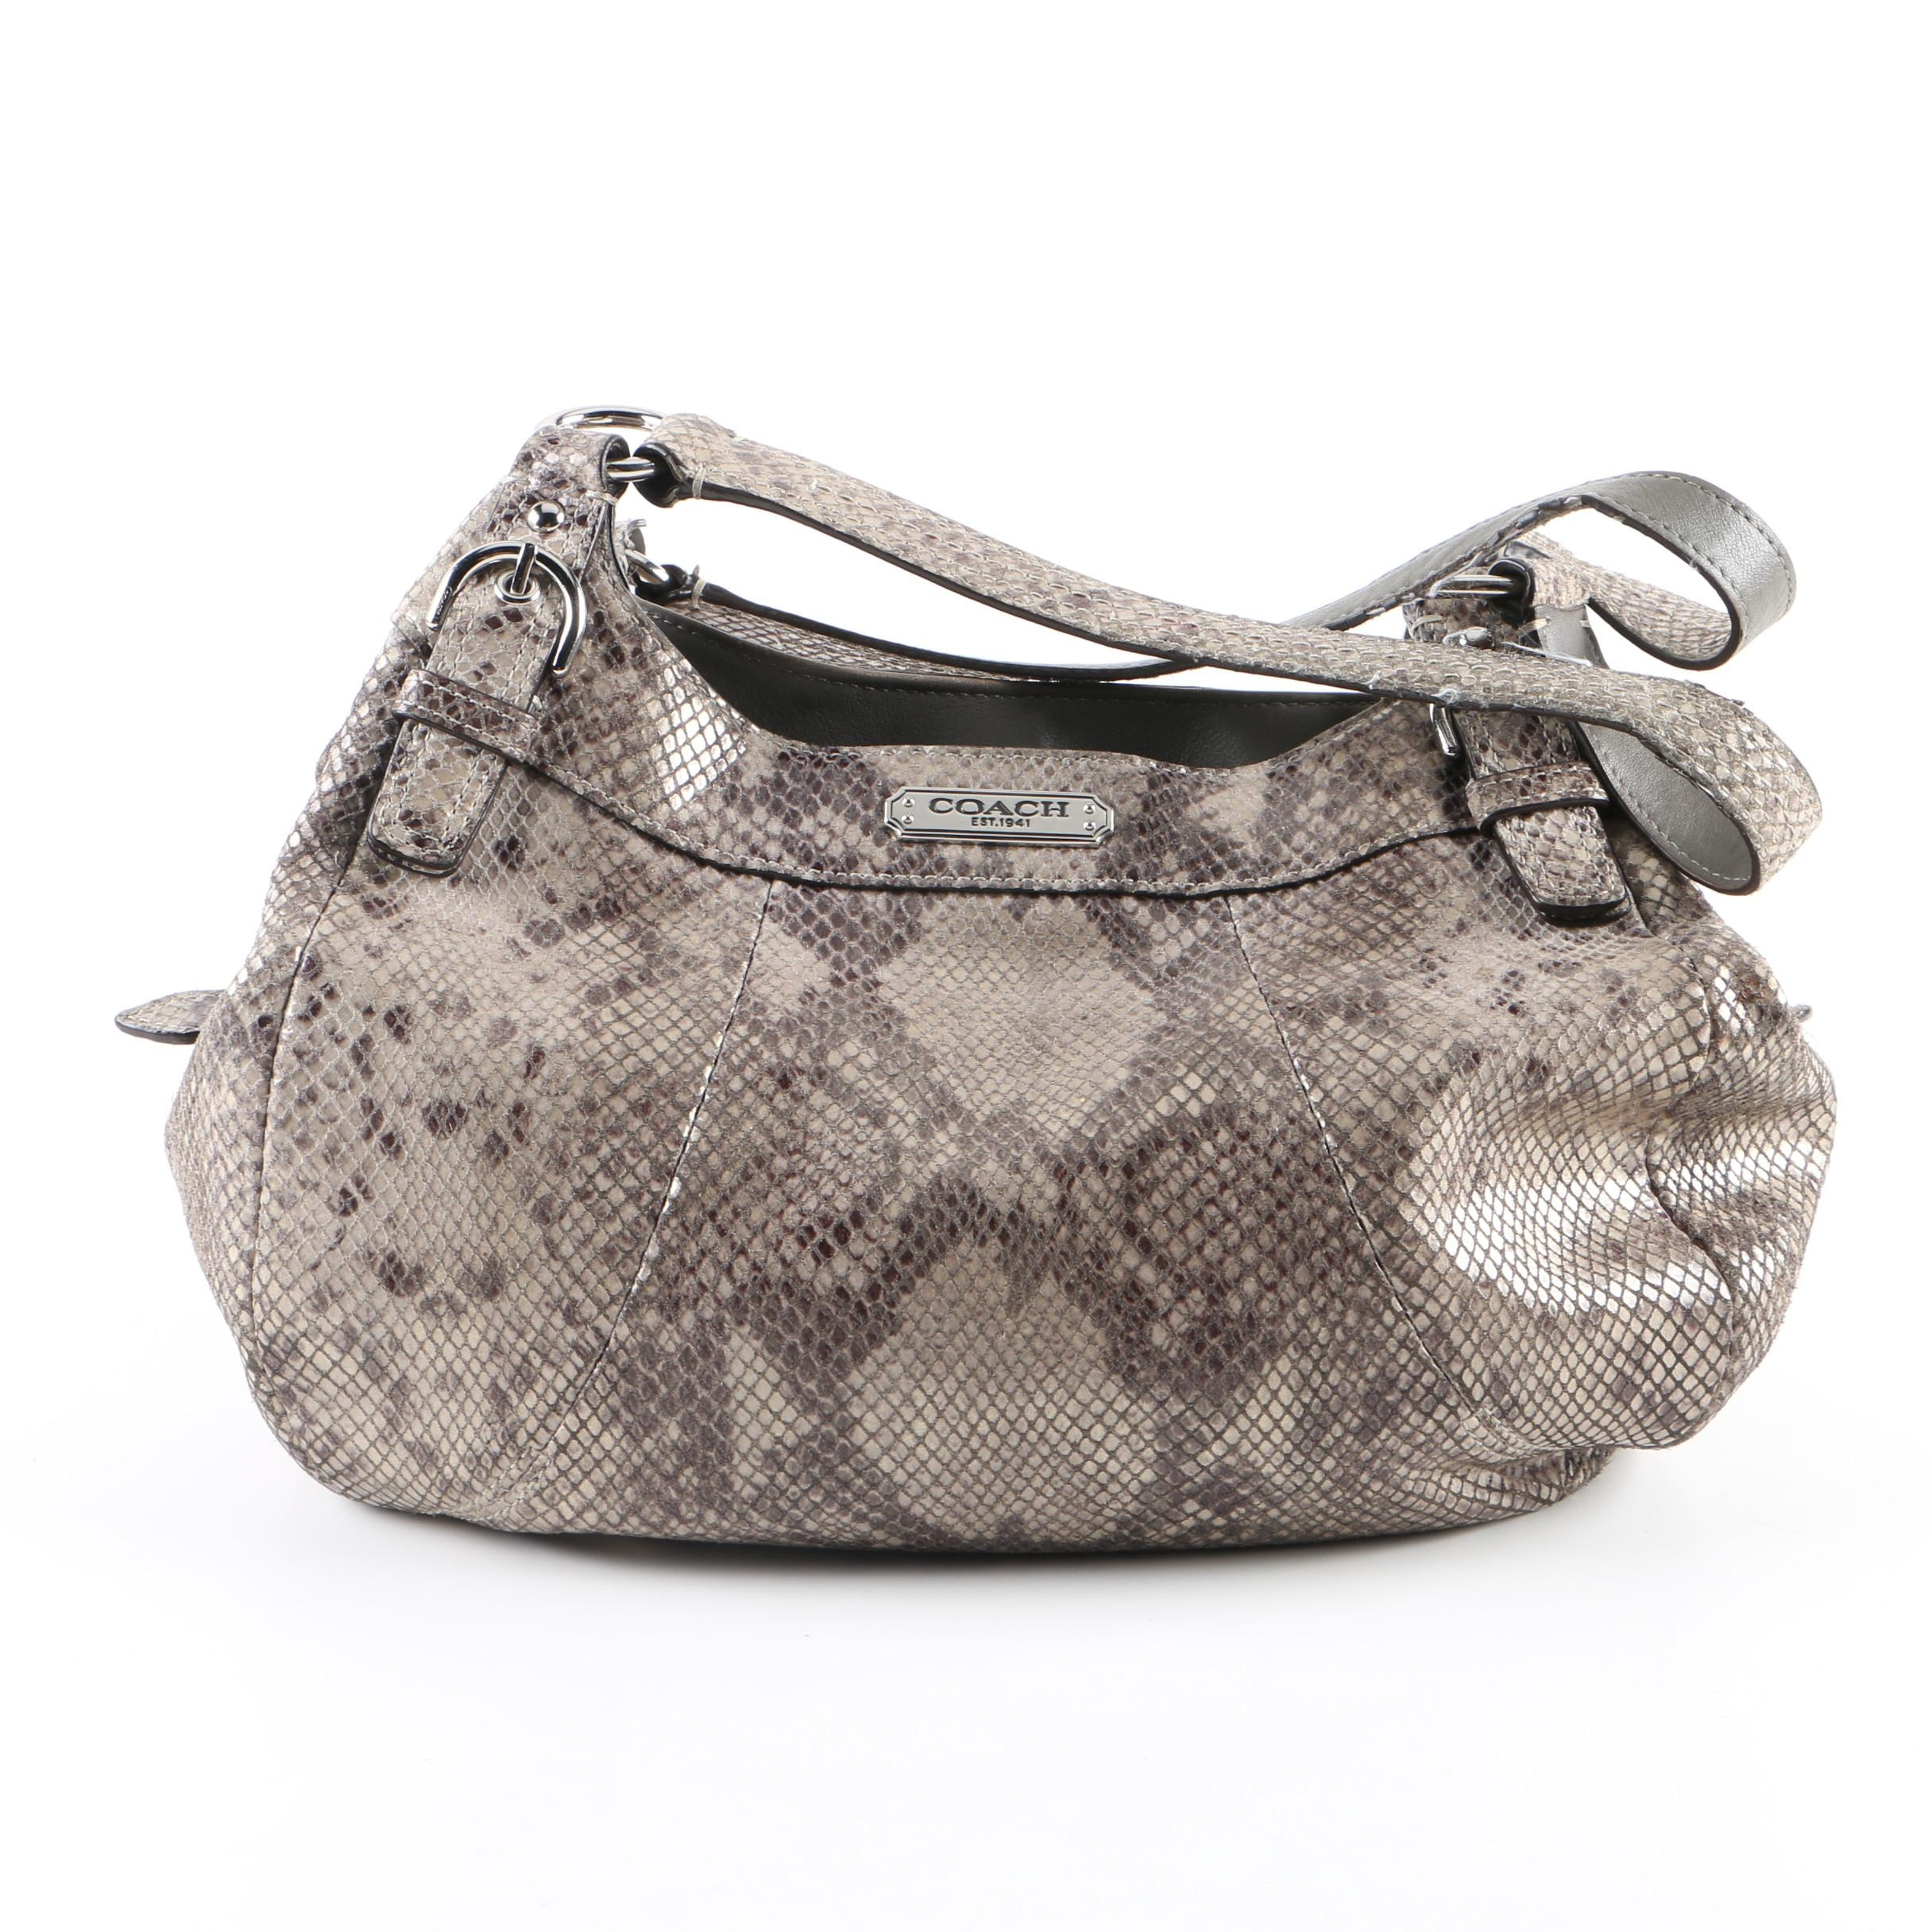 Coach Madison Python Skin Embossed Leather Hobo Bag